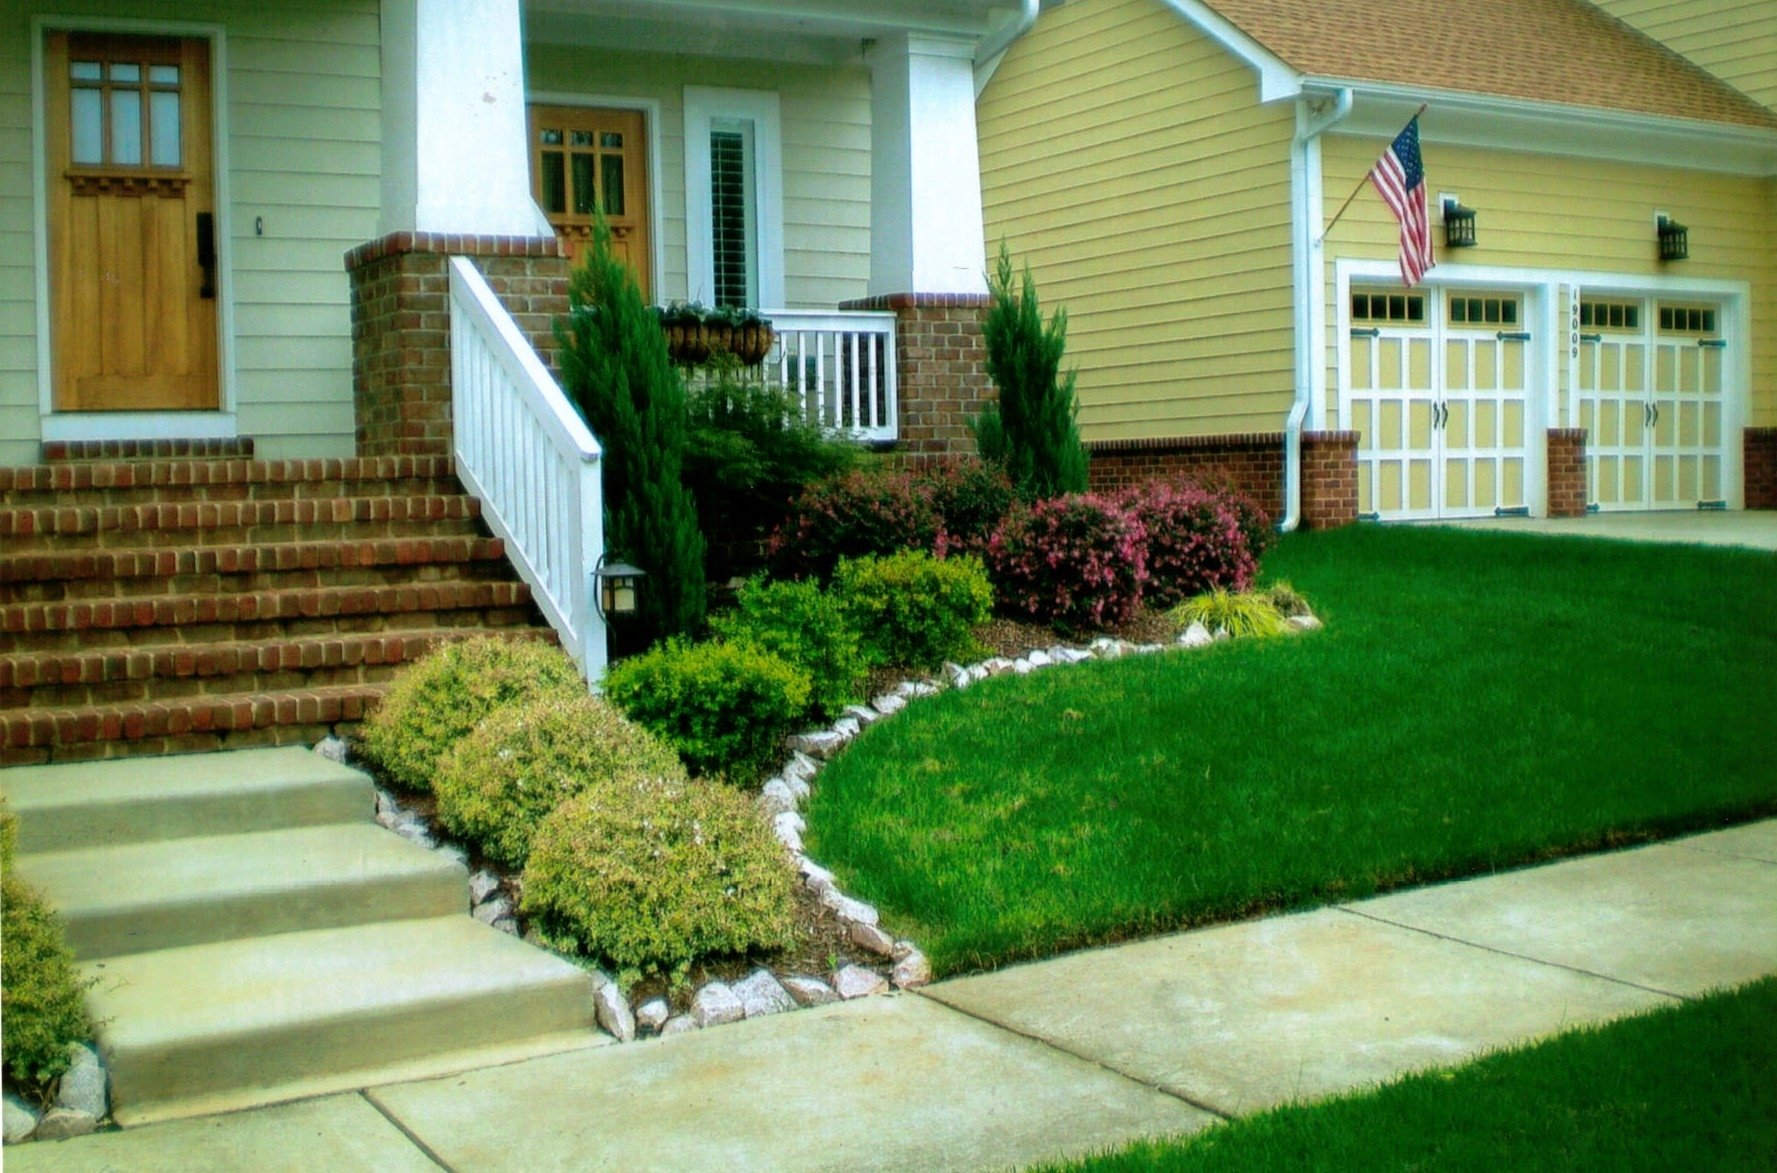 10 Elegant Simple Landscaping Ideas For Front Yards modern simple front yard landscaping ideas manitoba design easy 1 2020